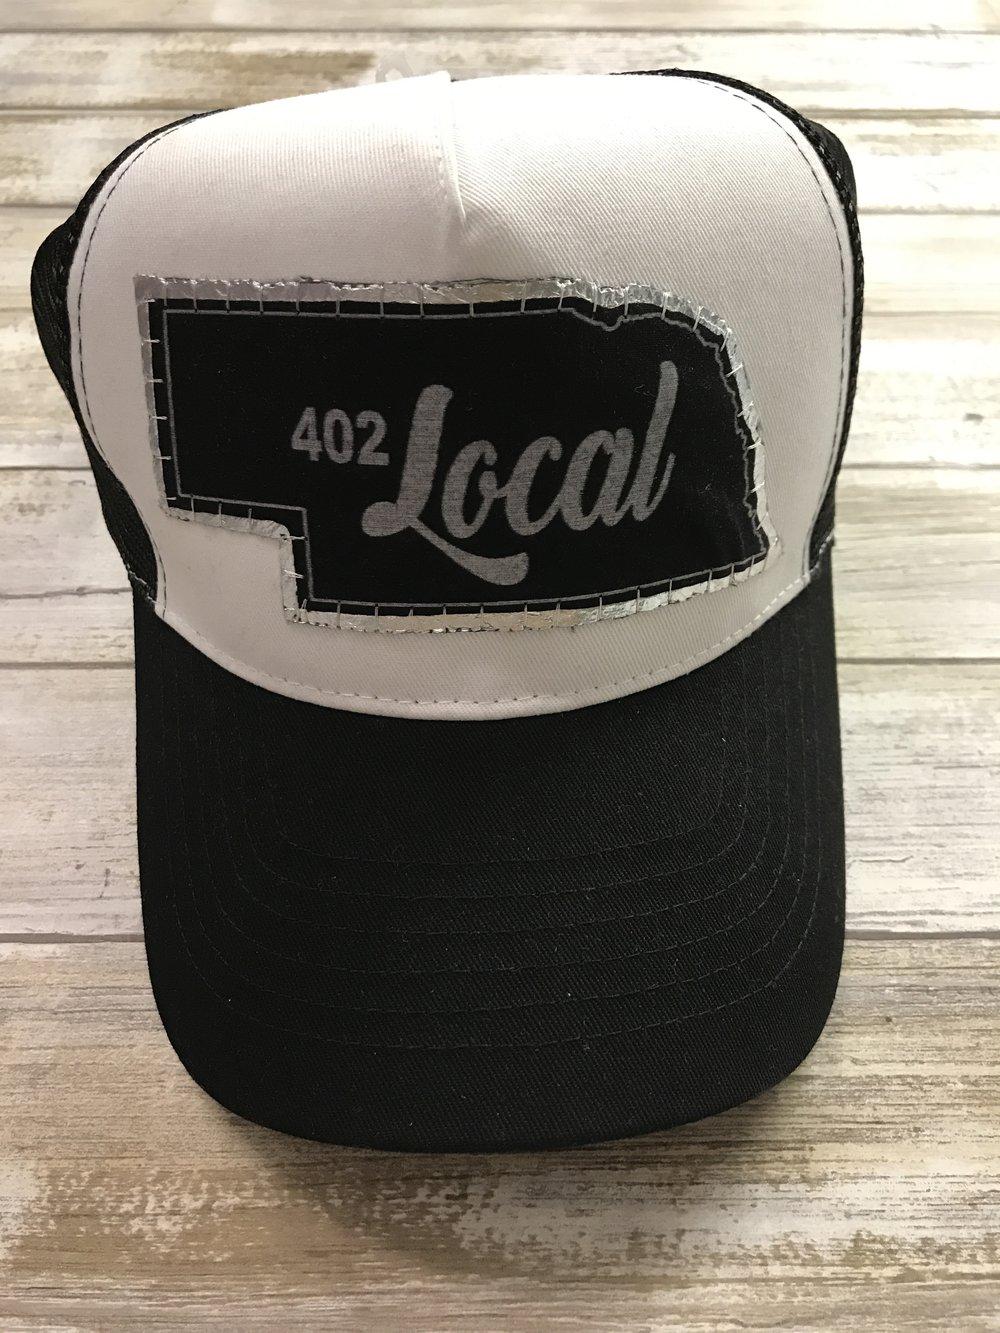 402 Local- Black Trucker Hat \u2014 Ash \u0026 Co.